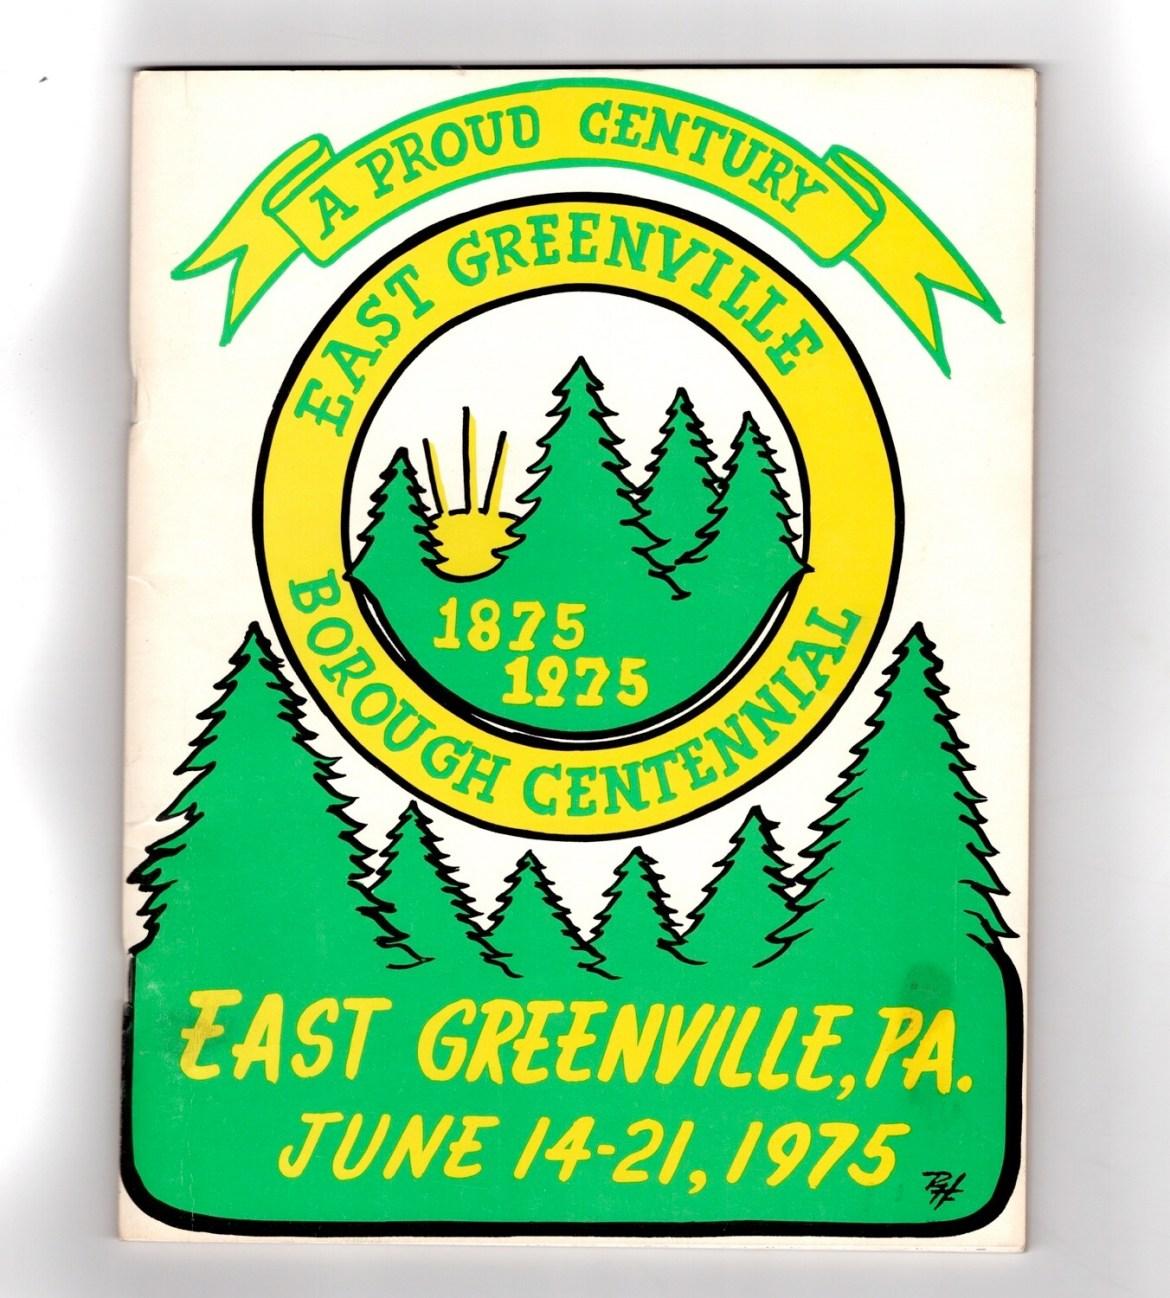 East Greenville Borough Centennial 1975